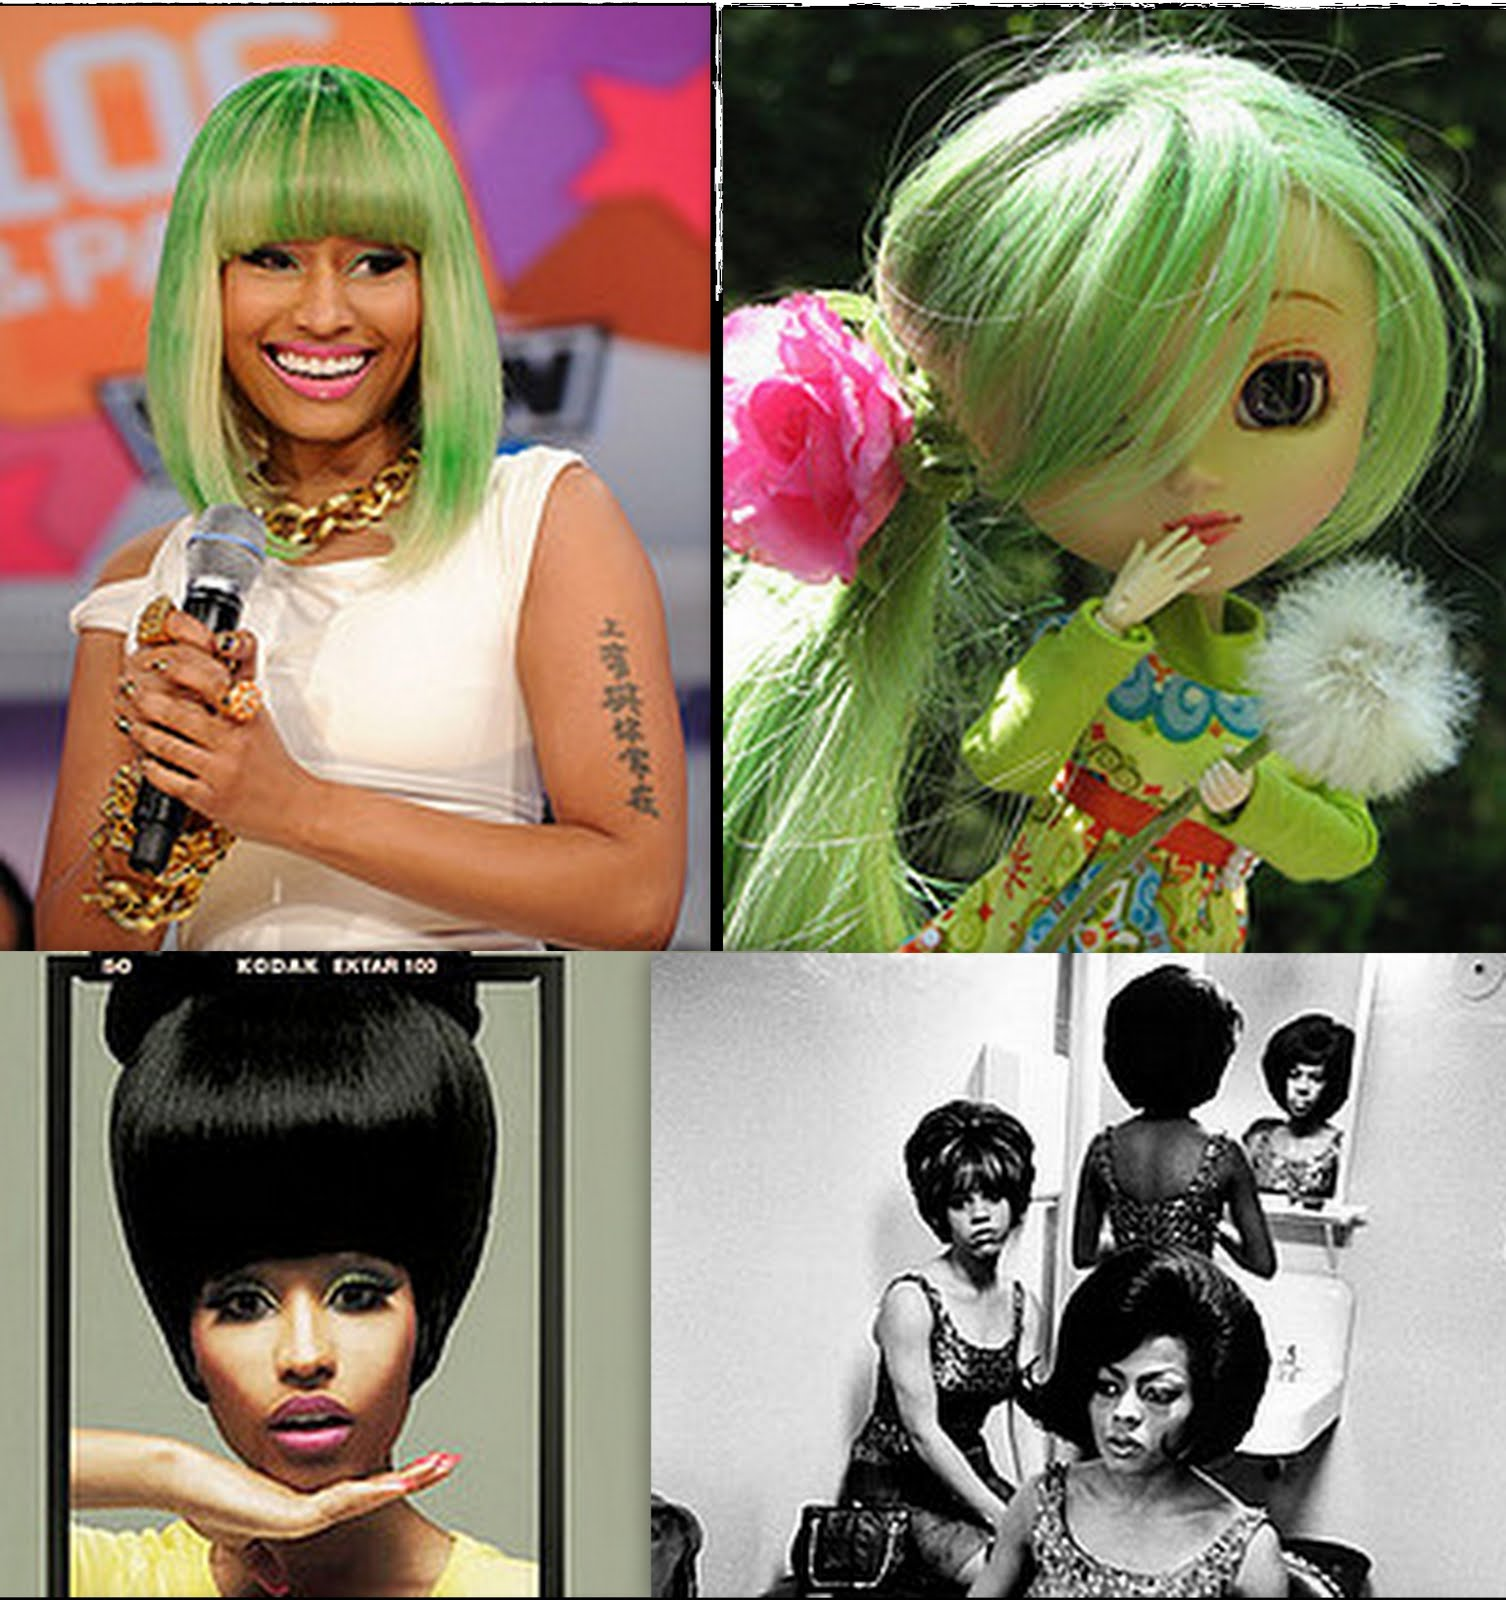 http://3.bp.blogspot.com/-2RwZrYtiXpk/Tut1zx7xAQI/AAAAAAAABbE/v5ibpvQzGZg/s1600/Nicki+Minaj-hairstyles-junninho.blogspot.com-nicki+minaj+hair+shampalove+5.jpg